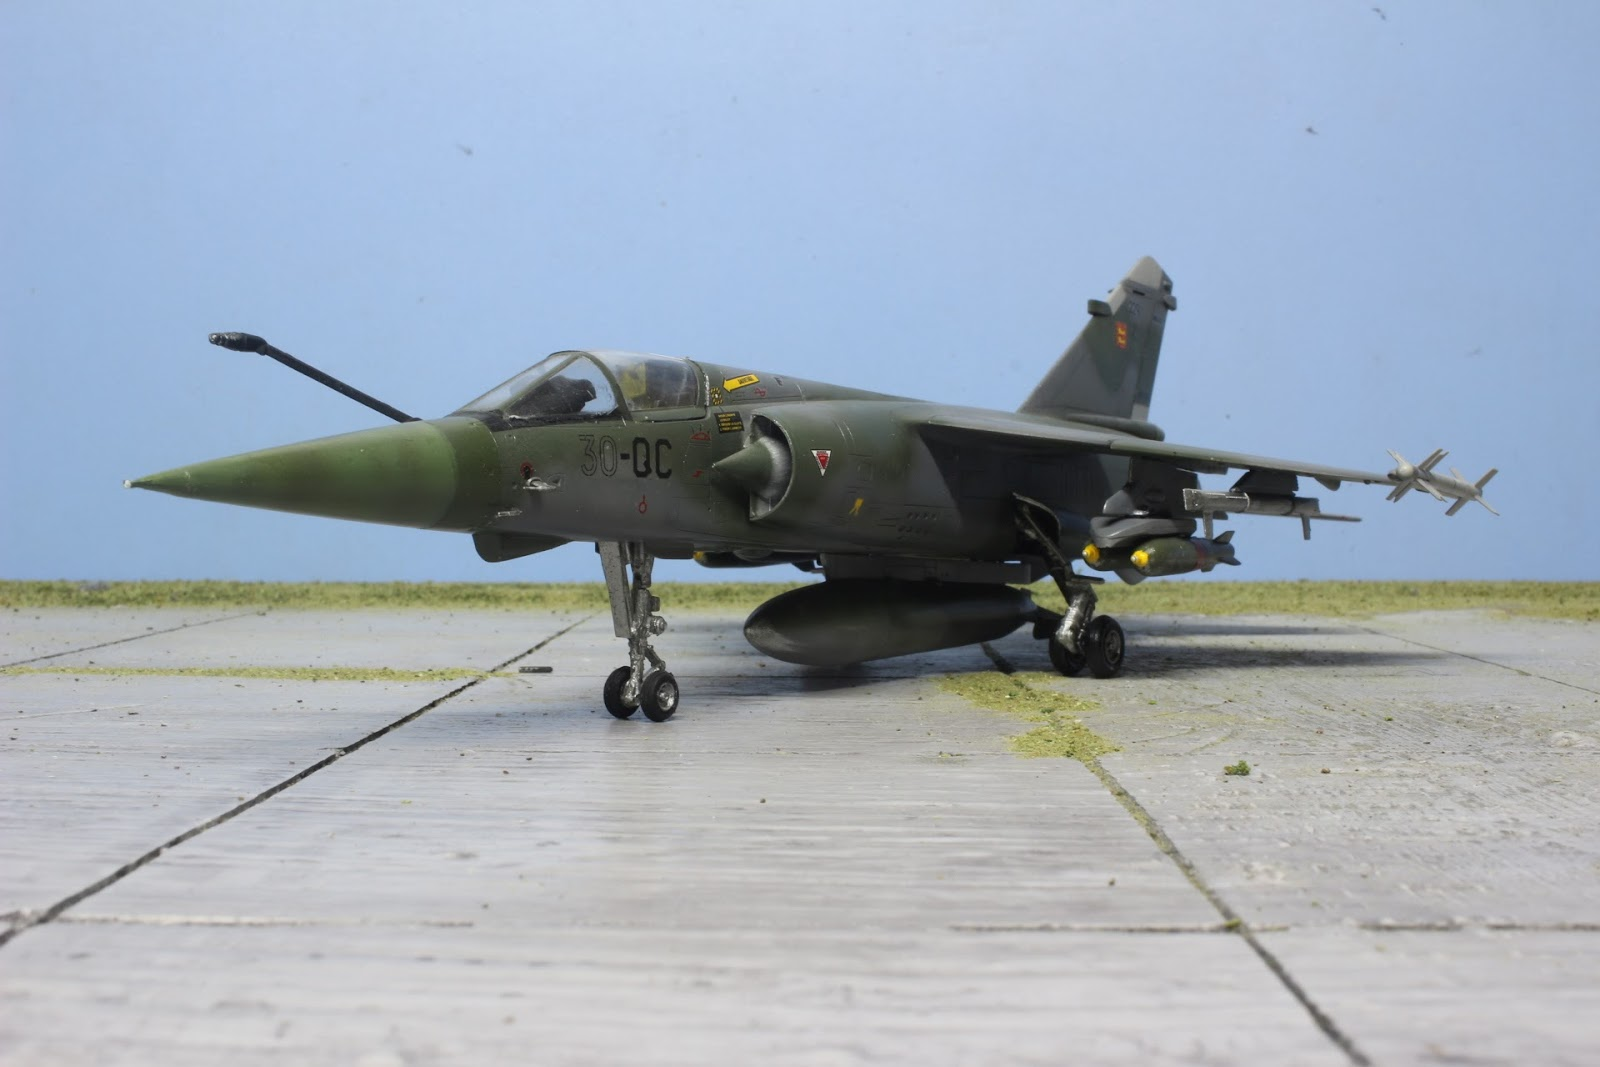 Rony La Maquette Maquette Du Mirage F1 Ct D Italeri Au 1 48